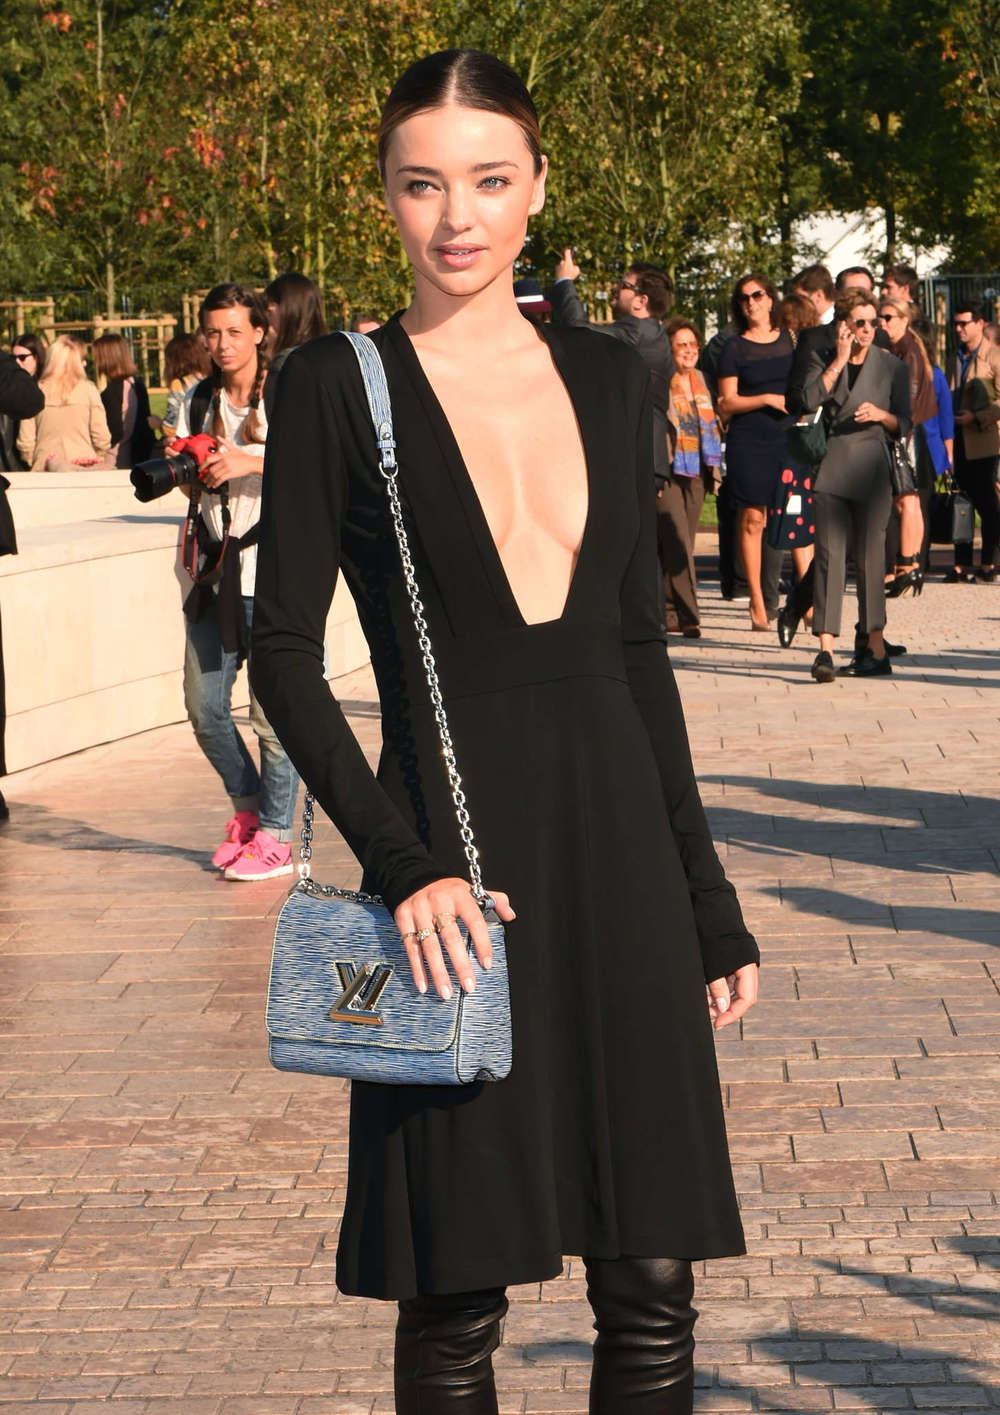 Miranda Kerr image via www.gotceleb.com